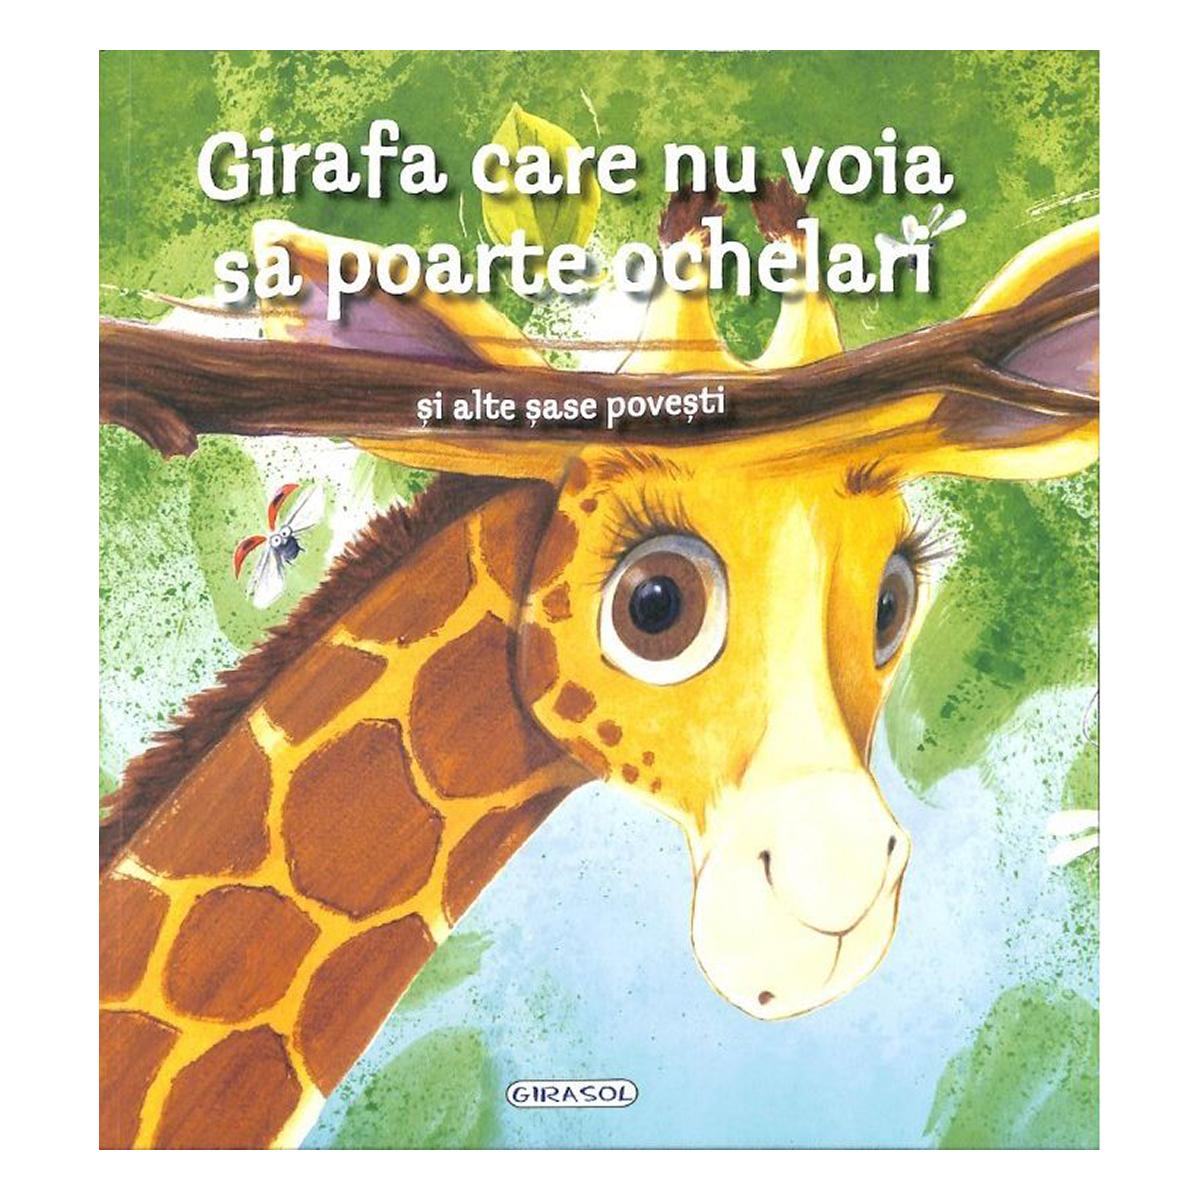 Editura GIRASOL - Girafa care nu voia sa poarte ochelari si alte sase povesti imagine 2021